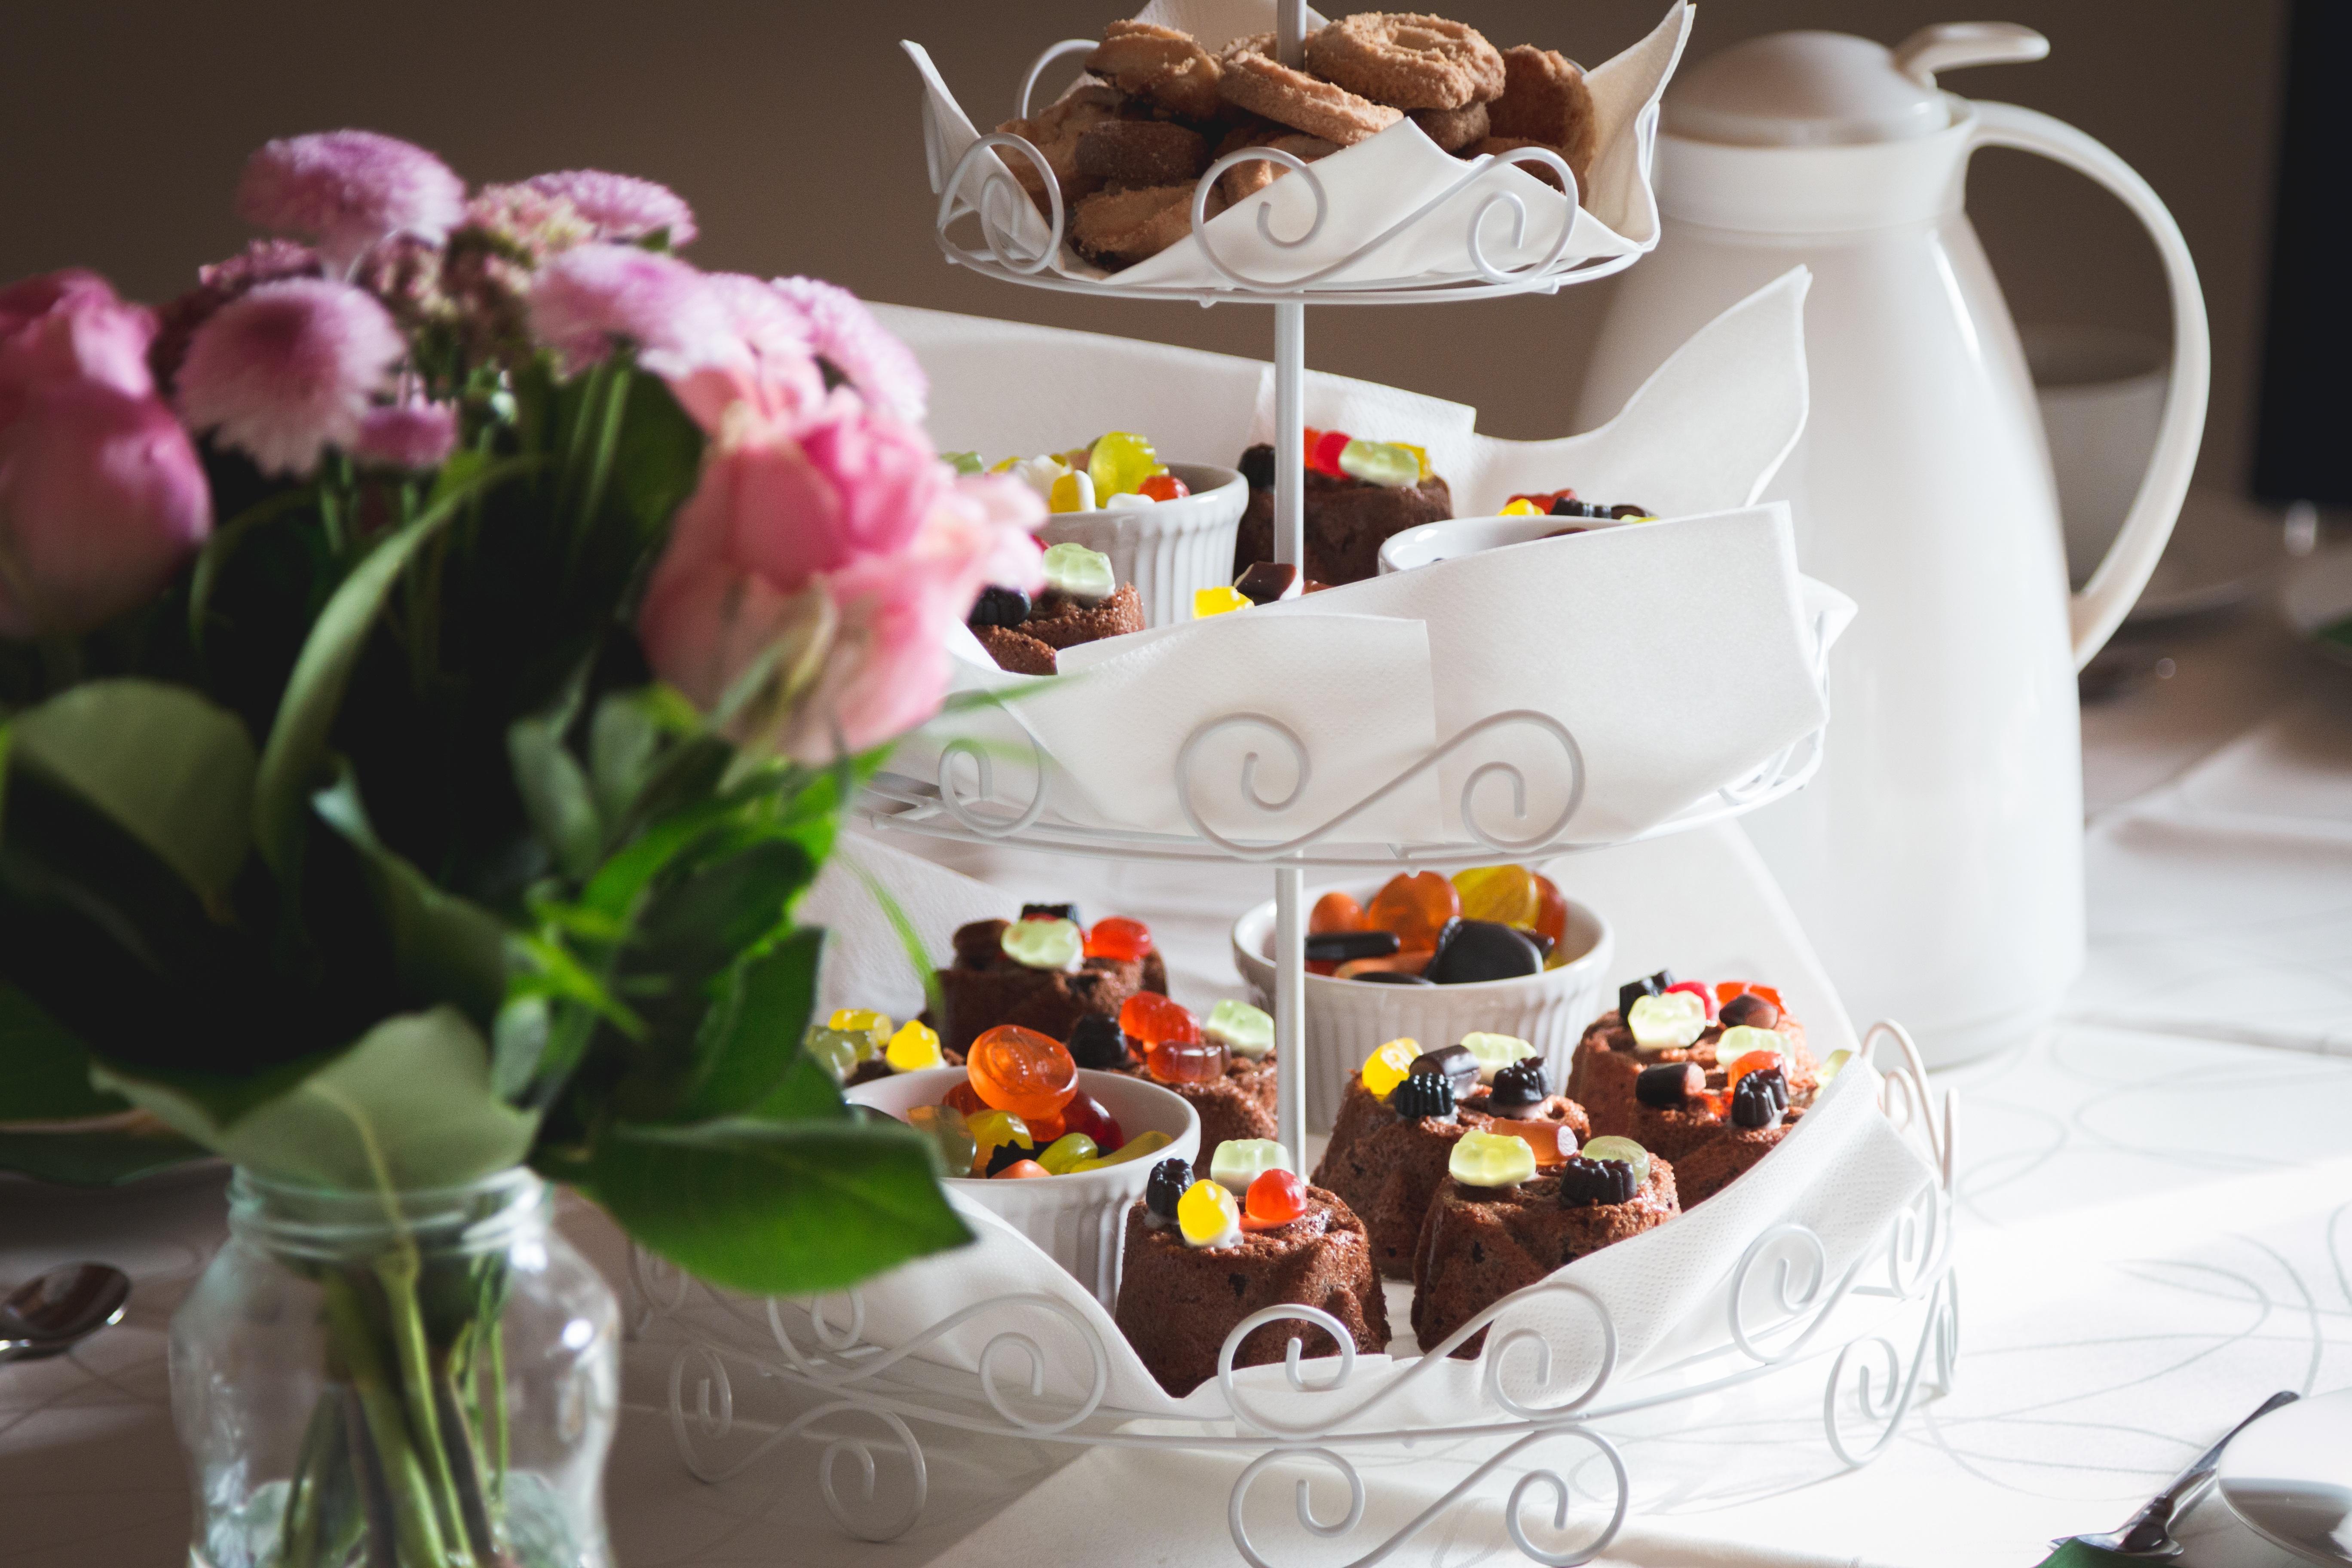 Free Images : tea, meal, food, biscuit, dessert, party, floristry ...